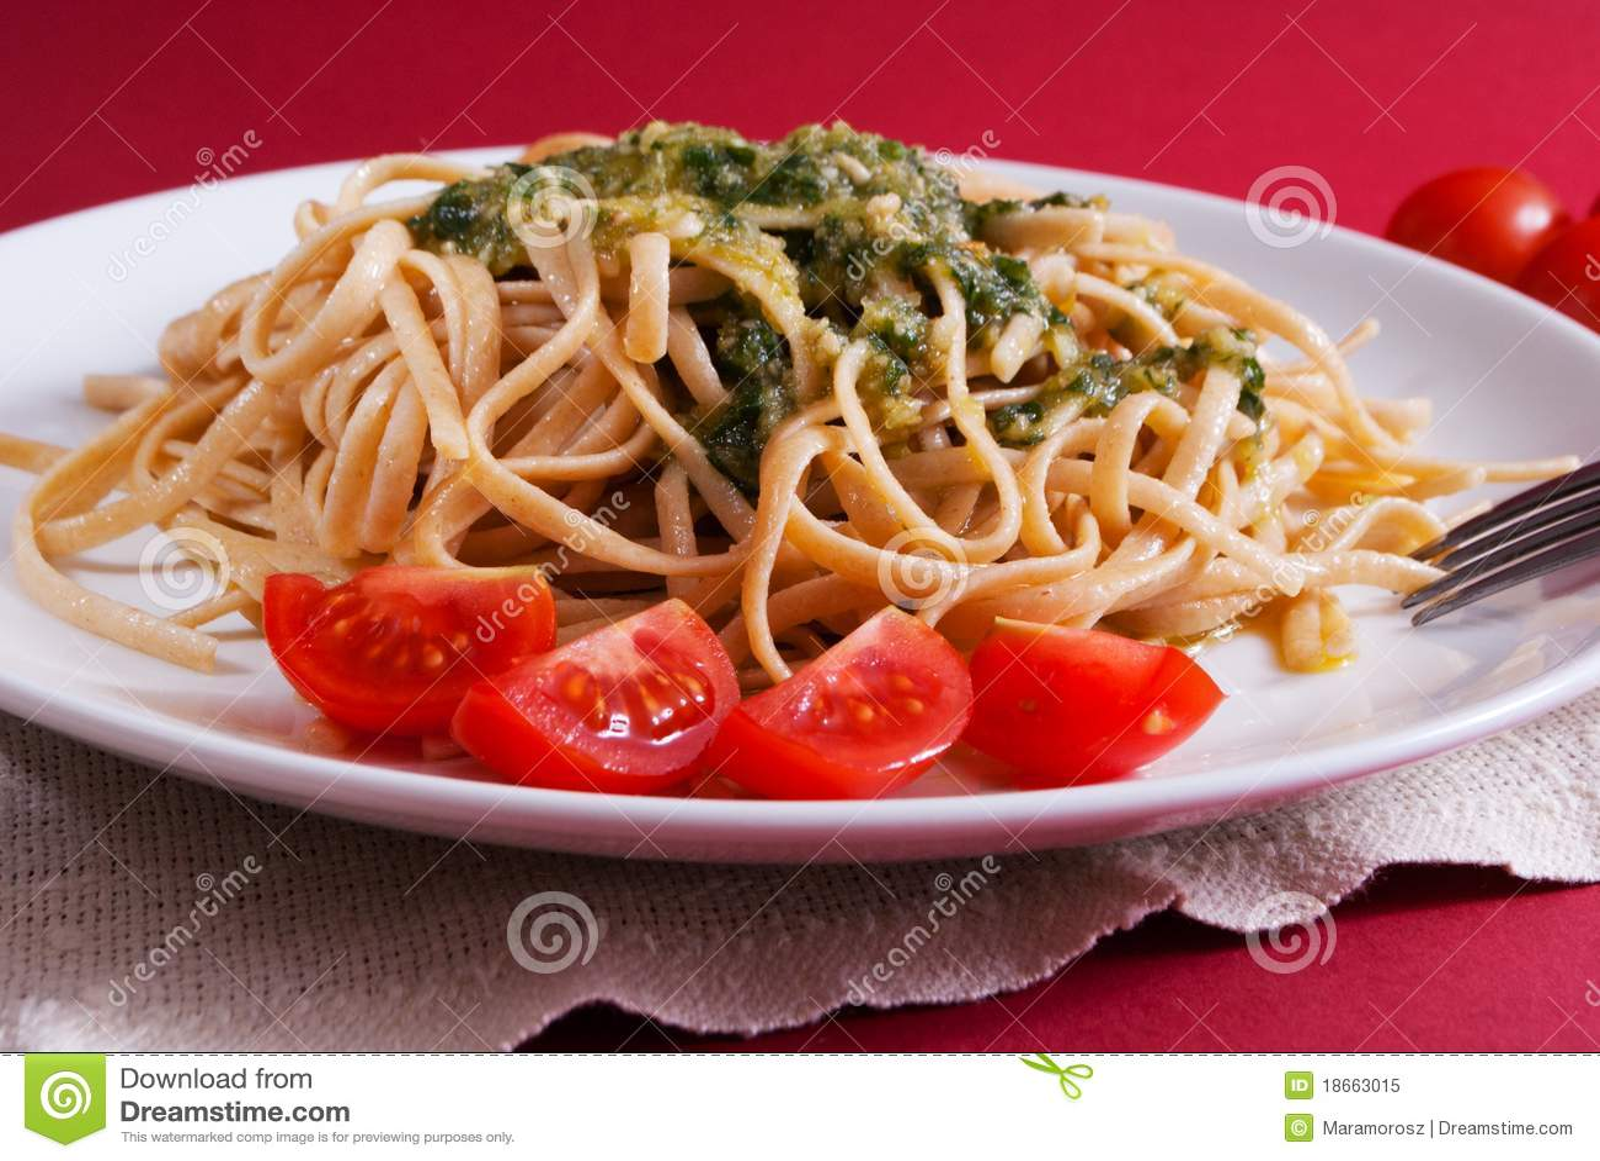 how to cook pesto sauce pasta